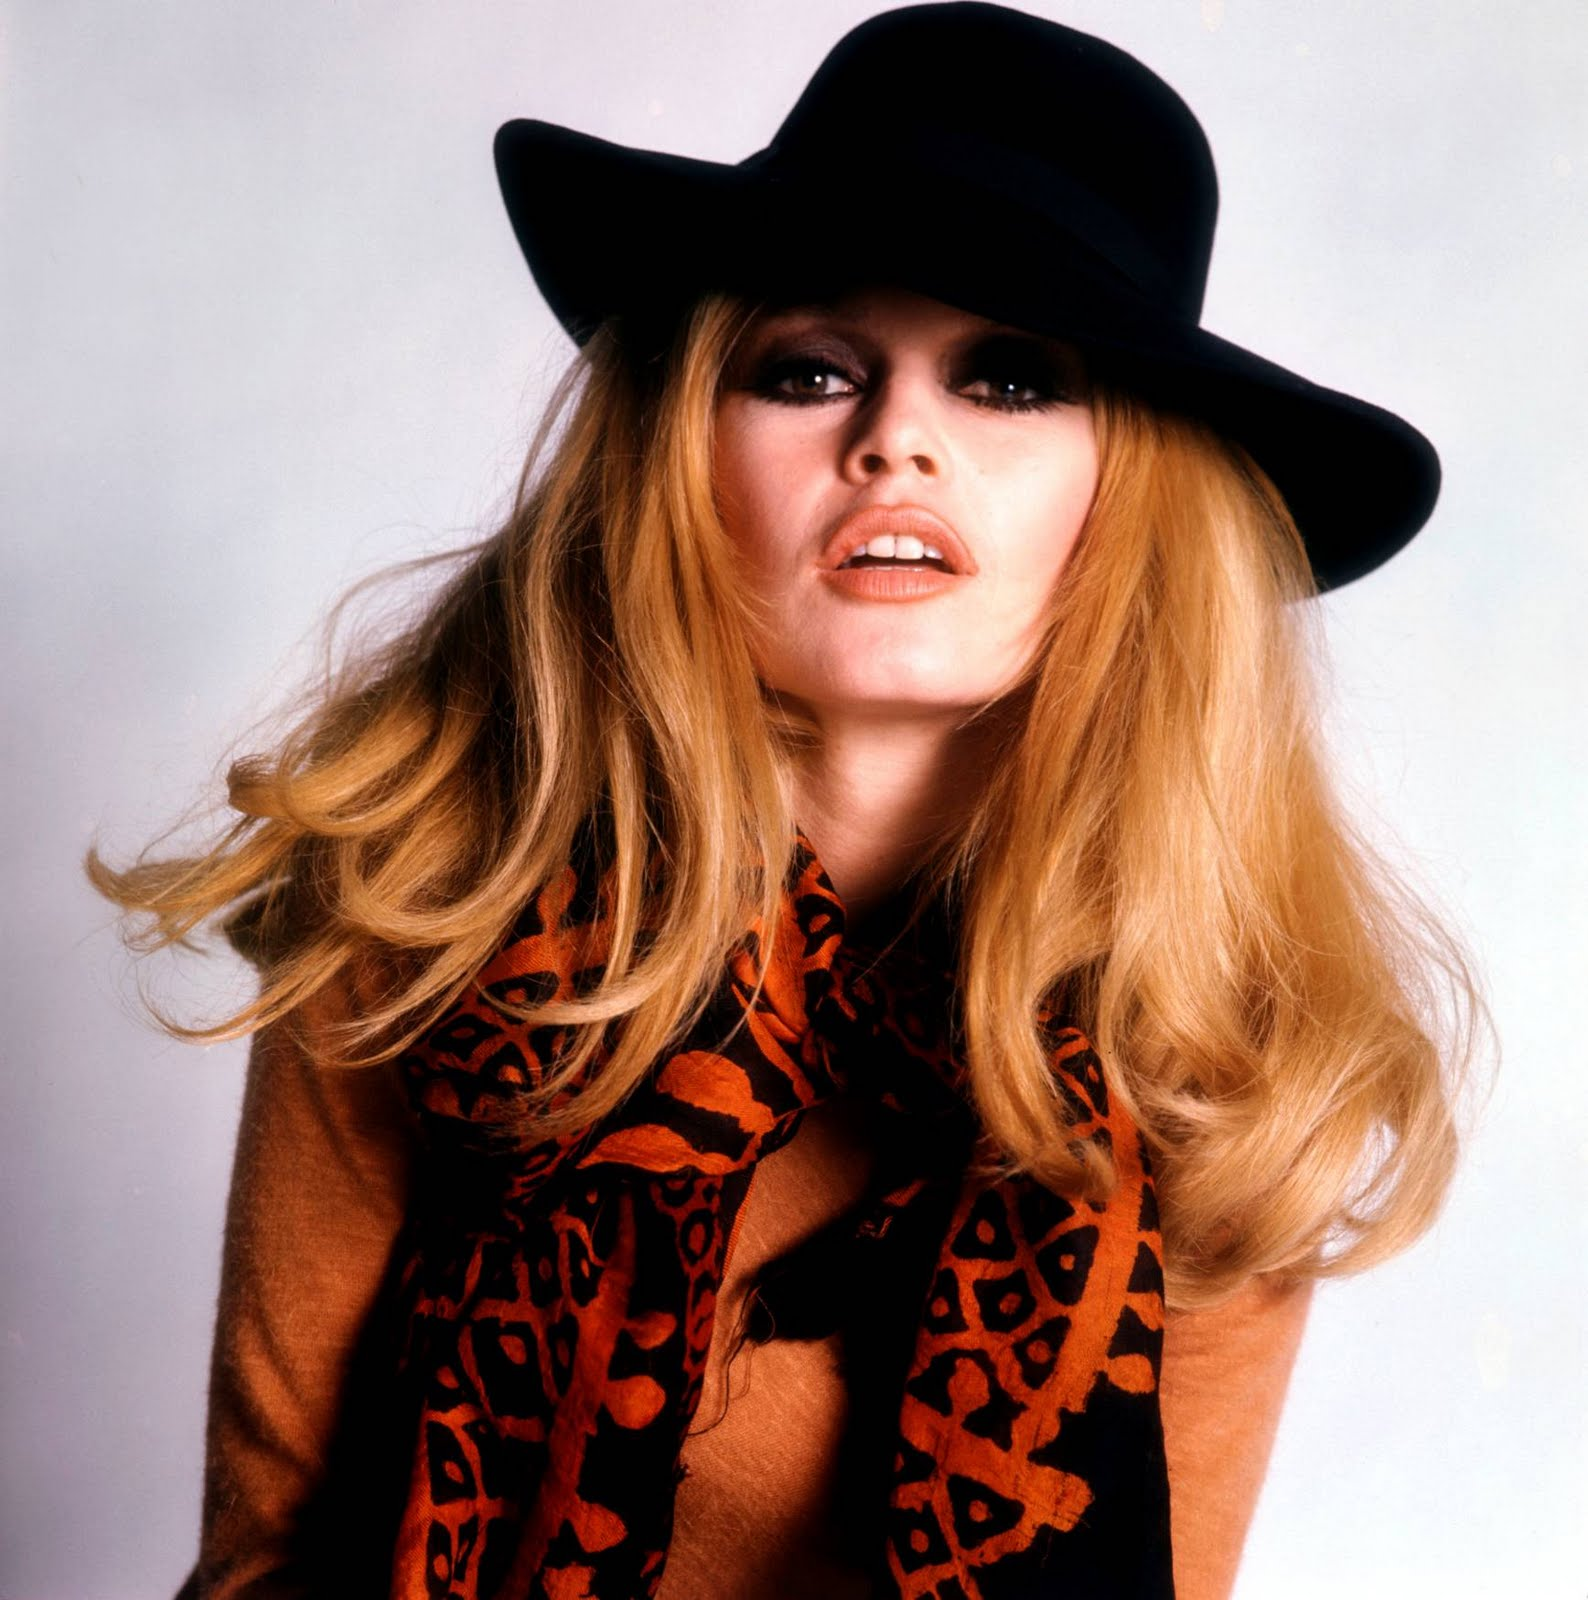 http://3.bp.blogspot.com/-PdcNXjZjzrk/TlNcEy4cANI/AAAAAAAAIjc/hPF1HoUl7n4/s1600/Brigitte-Bardot-59.jpg